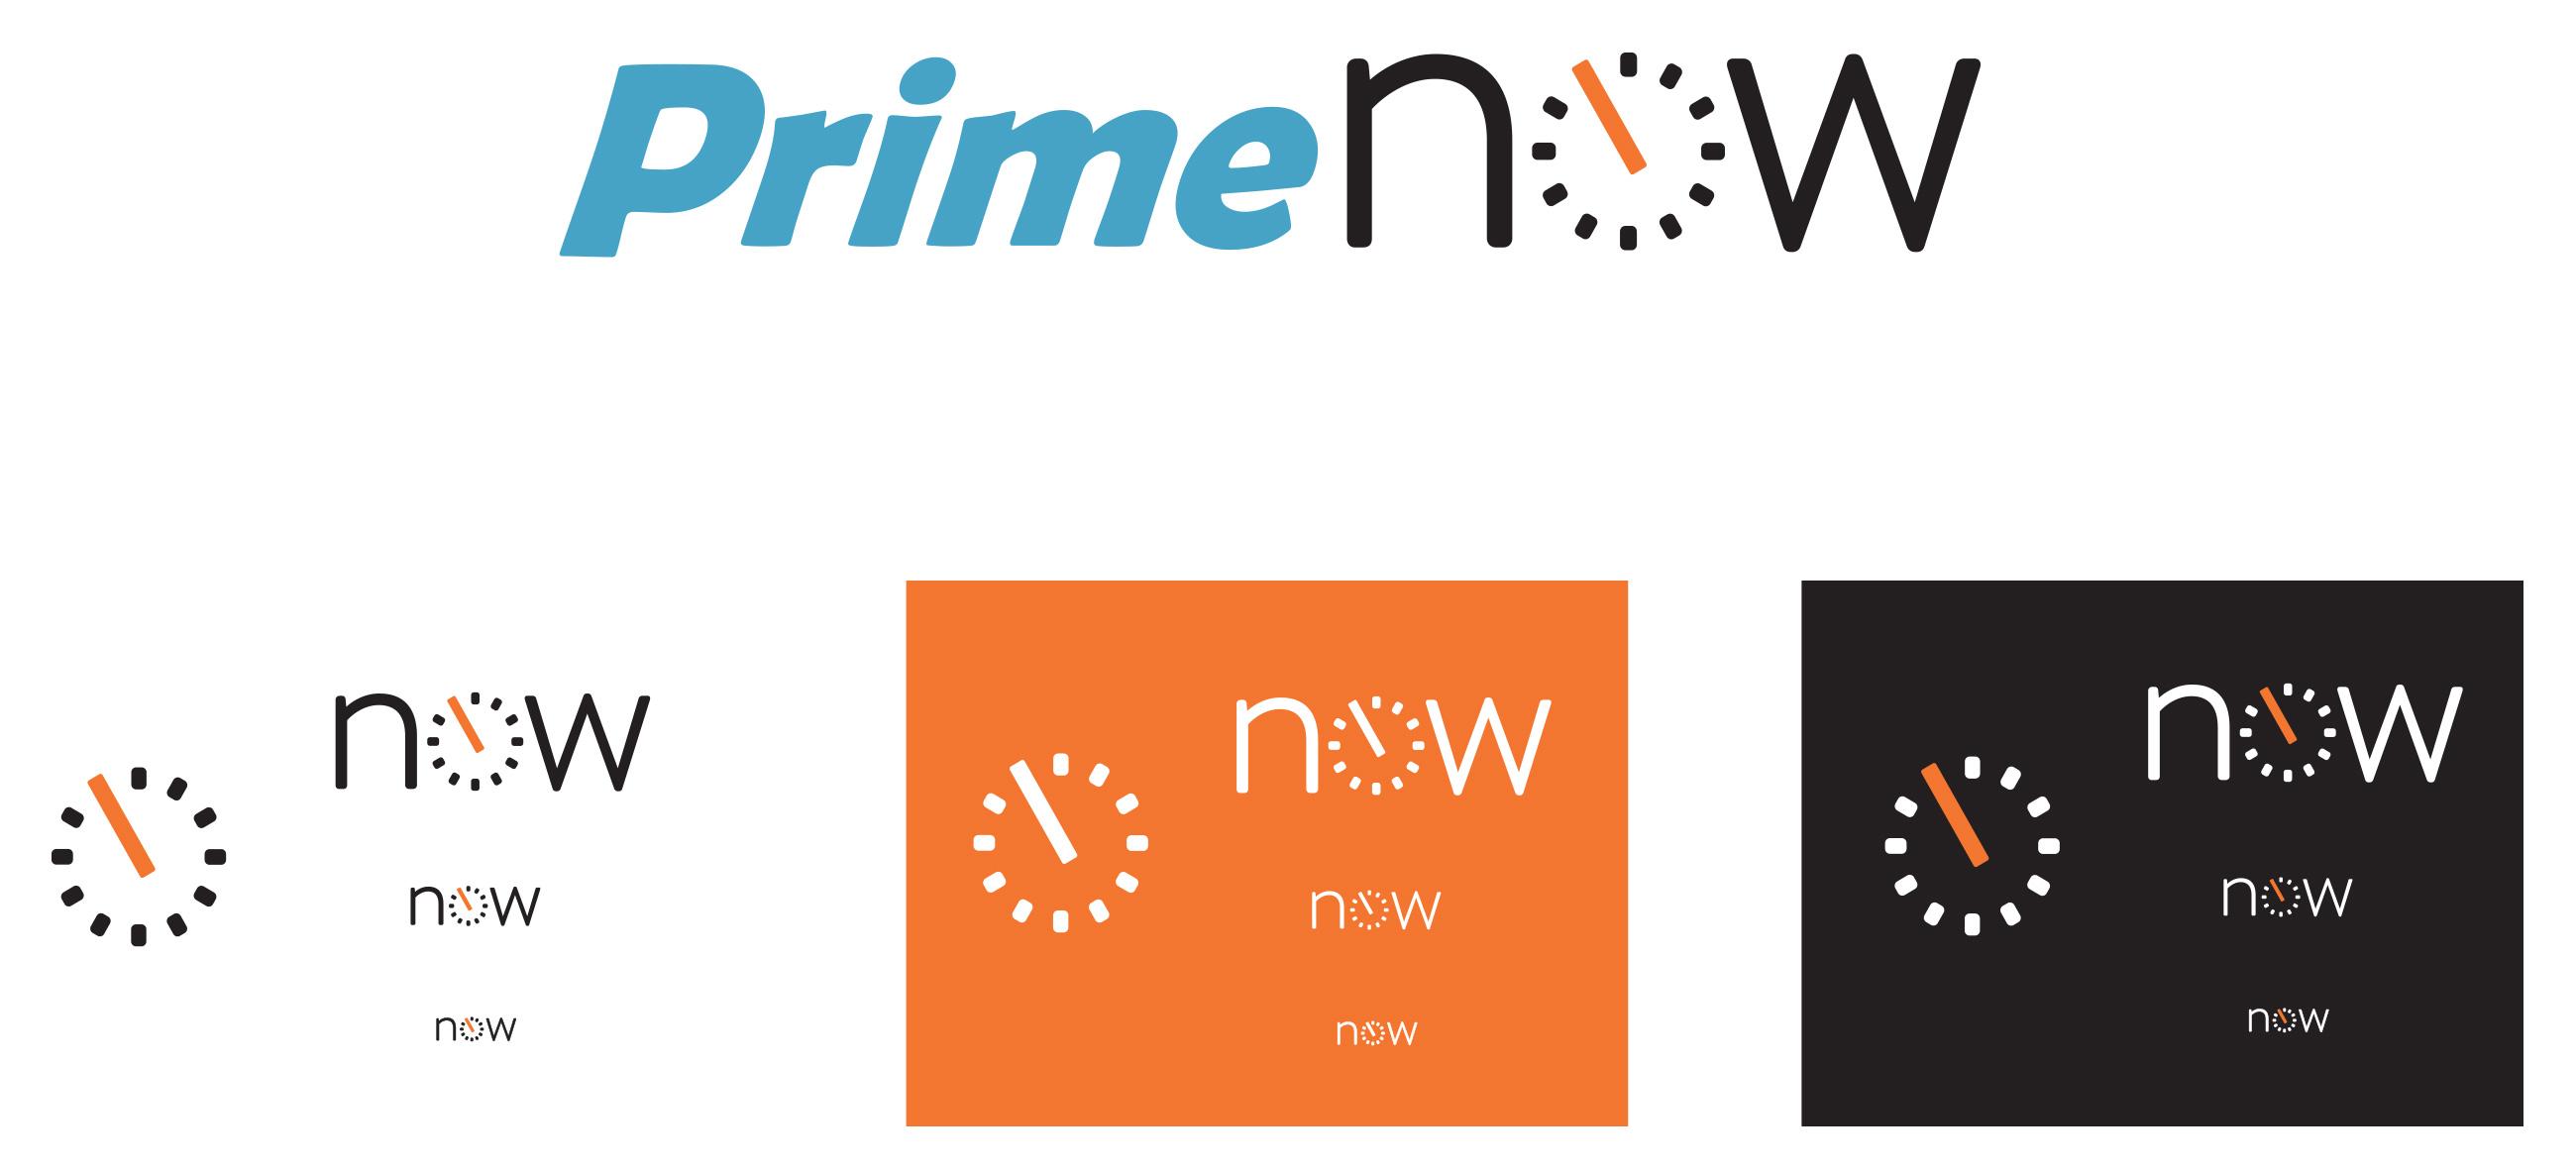 primenow_HA_launch_icon_logos